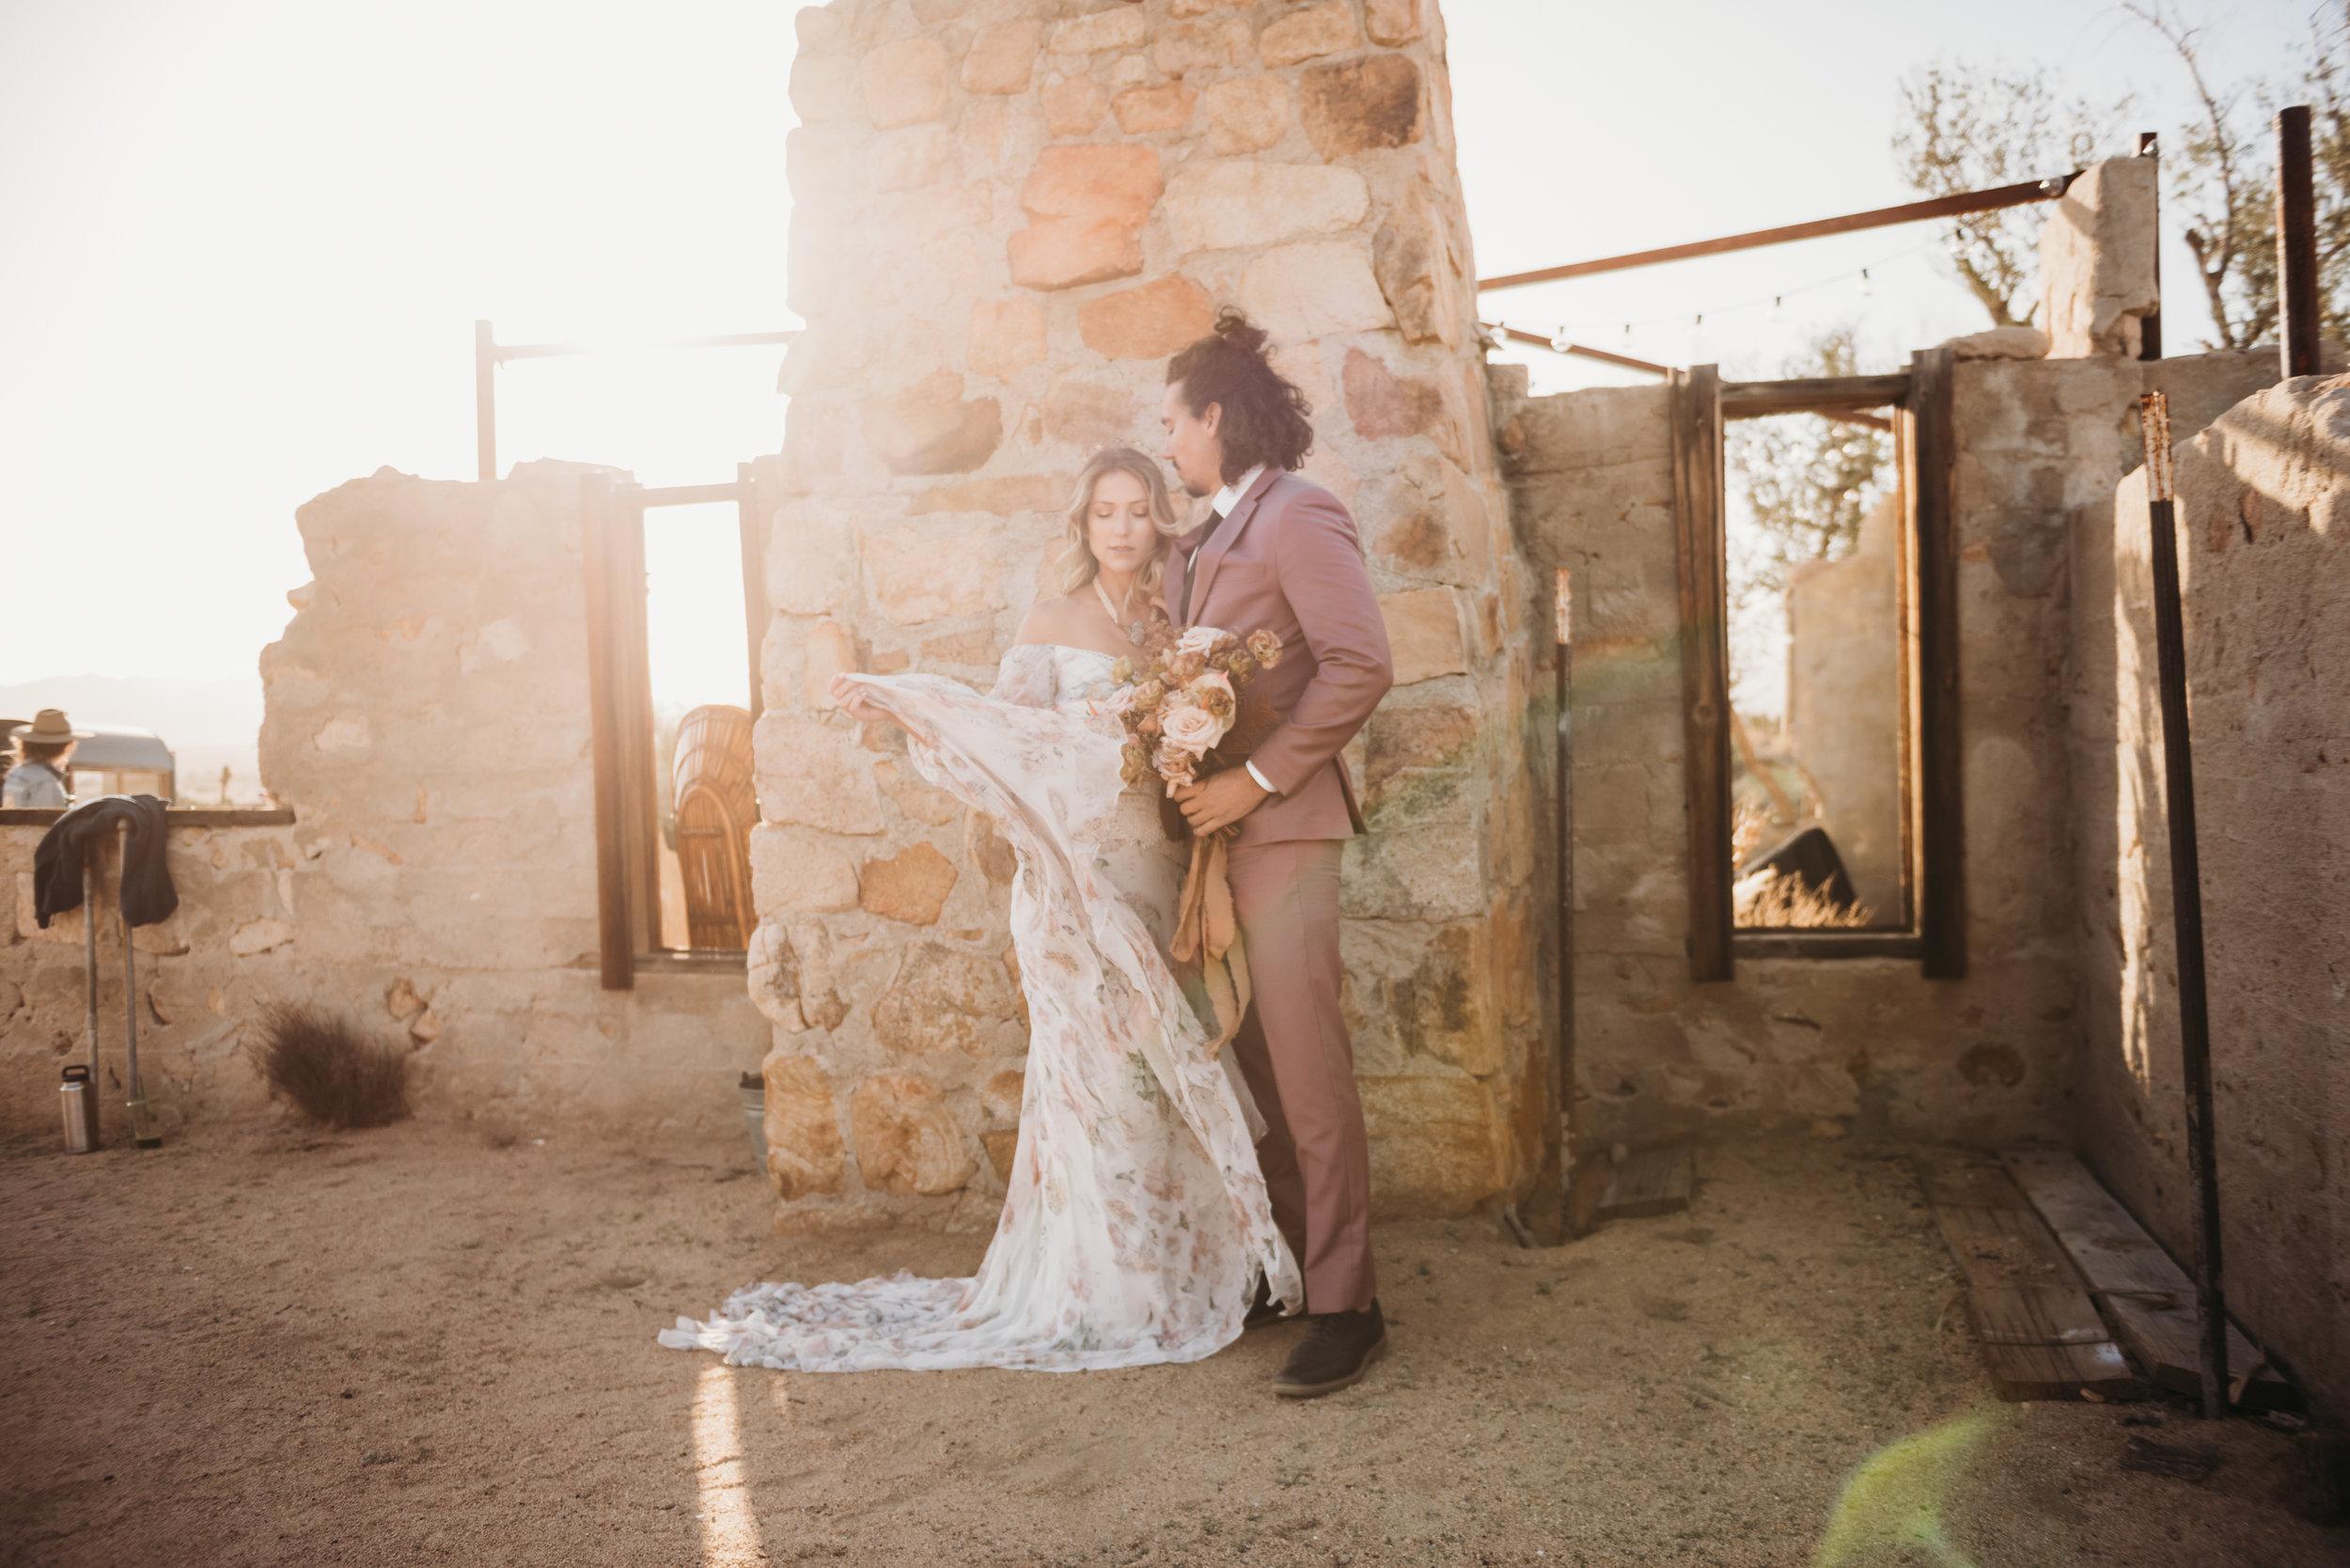 FortSt.John_photographer_TyraEPhotography_Wedding_Couple_Family_Photograhy_DawsonCreek_Elopement_Bride_Boduoir_Portraits-5043.jpg